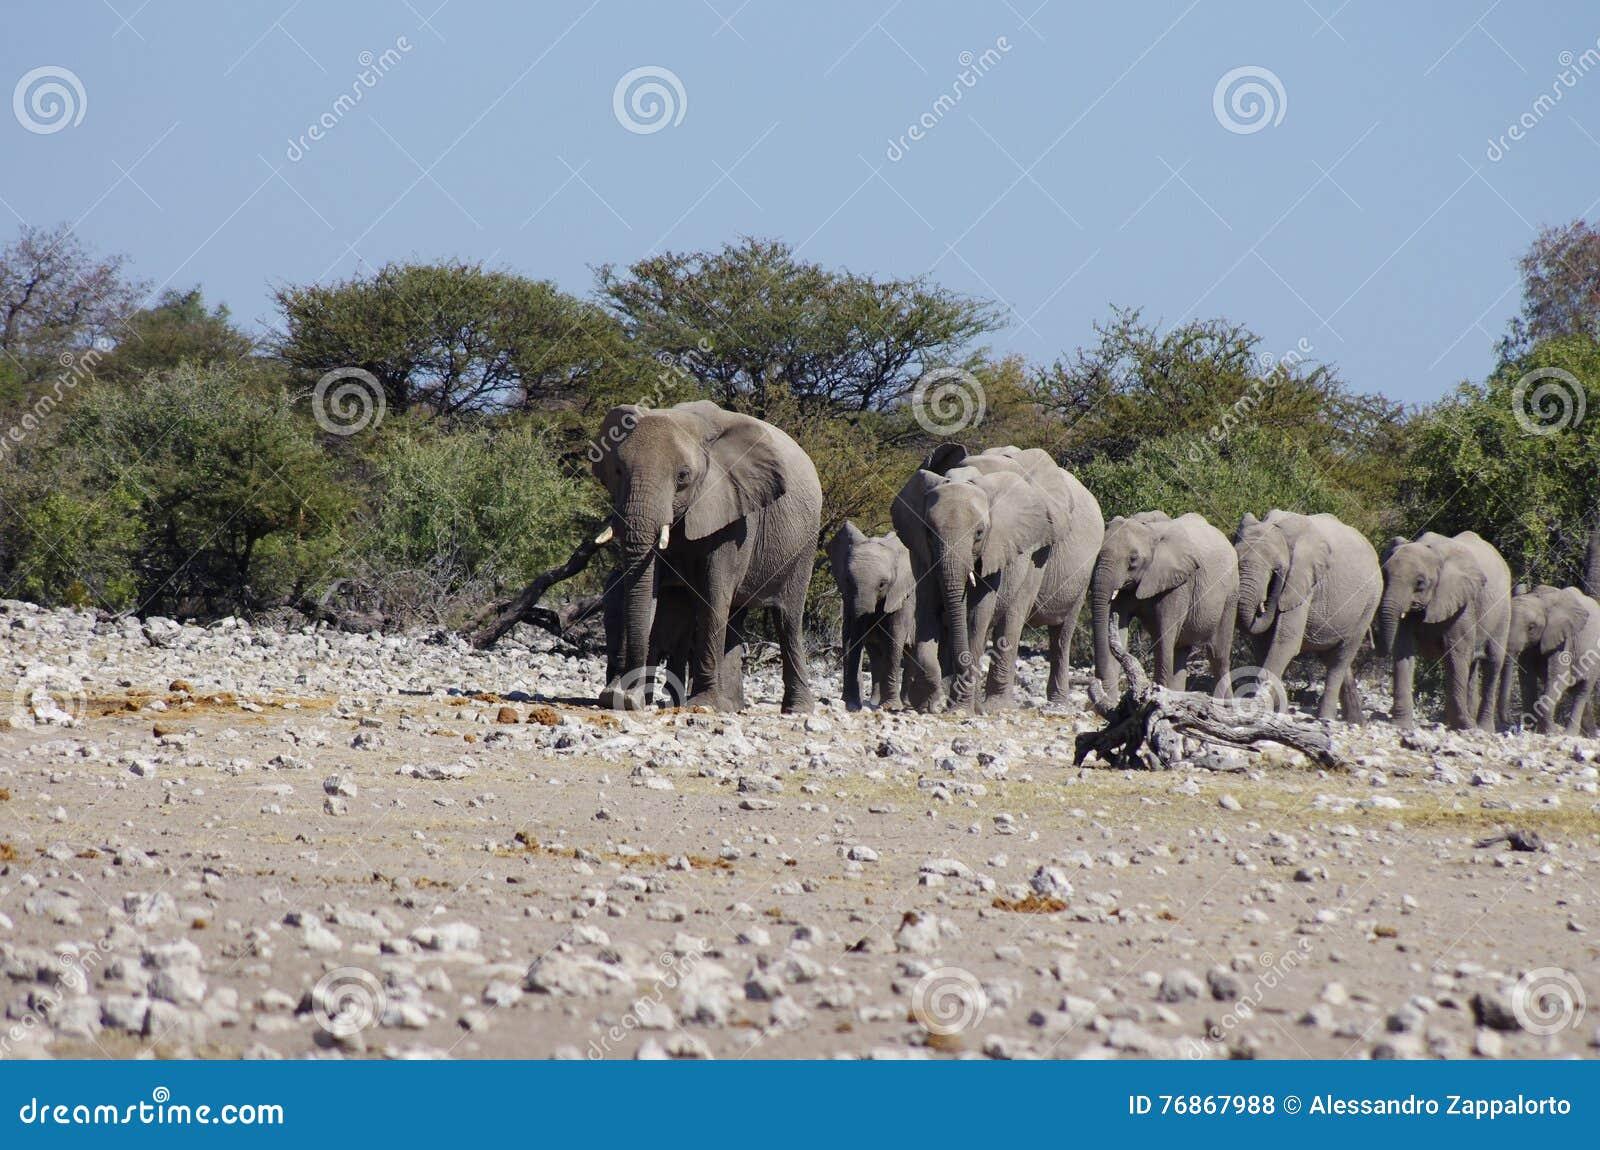 Wild Animals Of Africa: Group Of Elephants Stock Photo